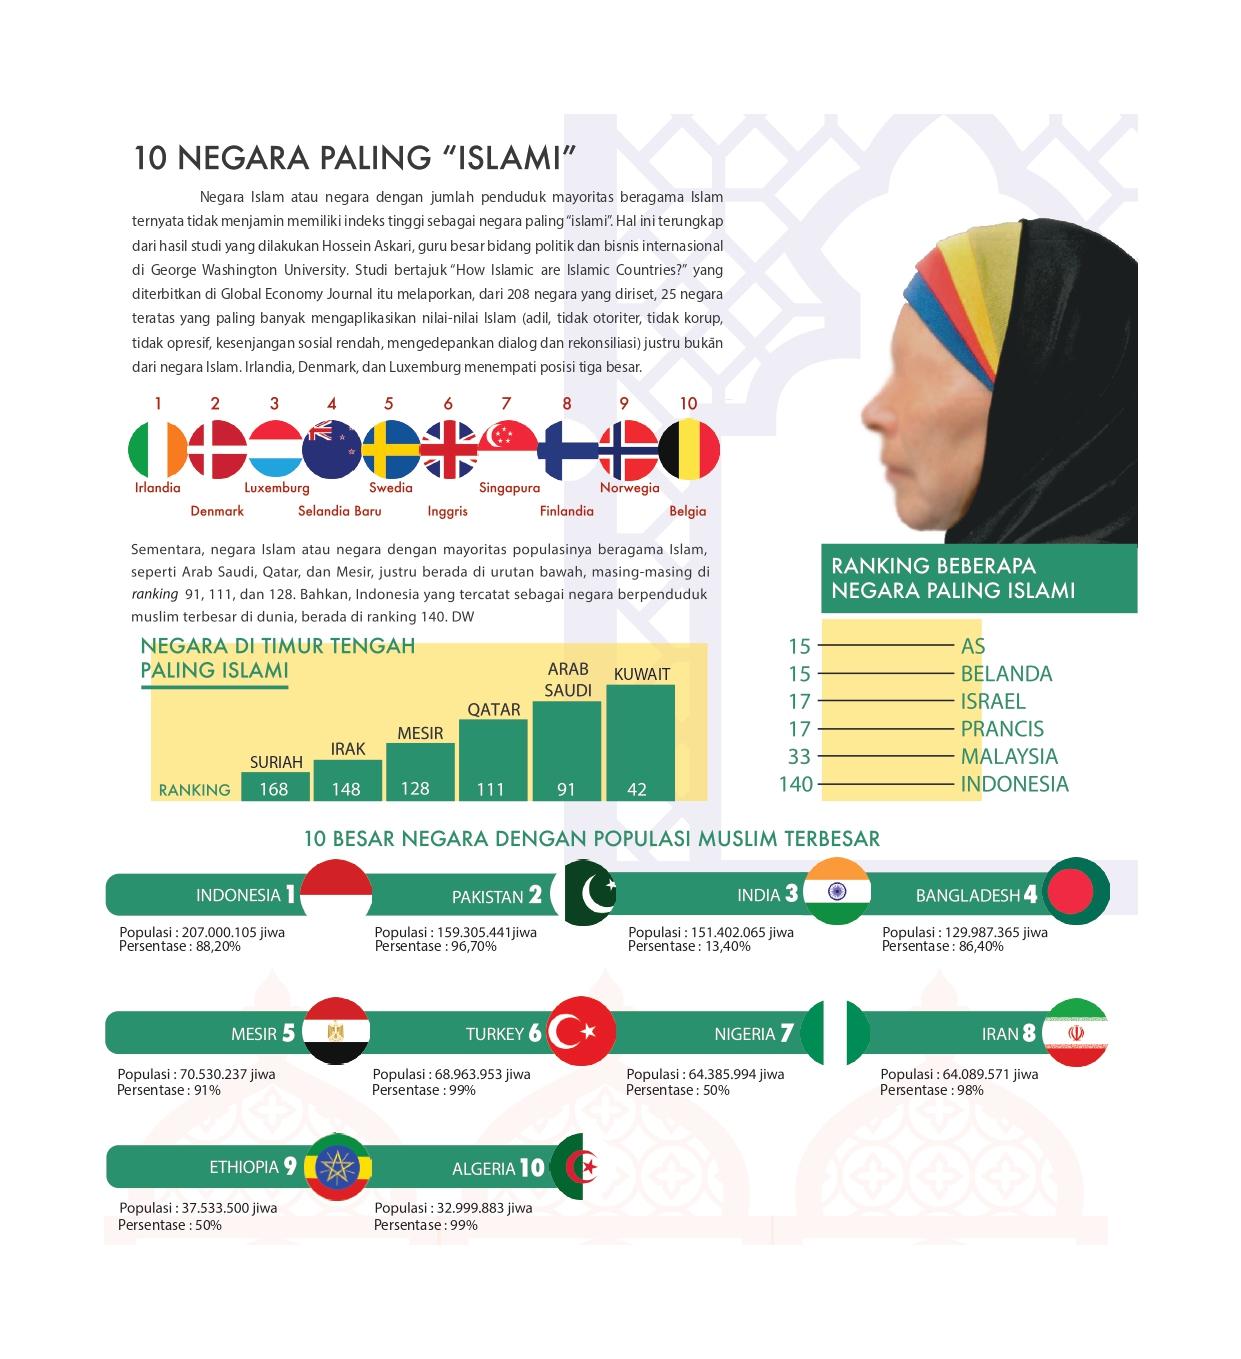 10 Negara Paling Islami